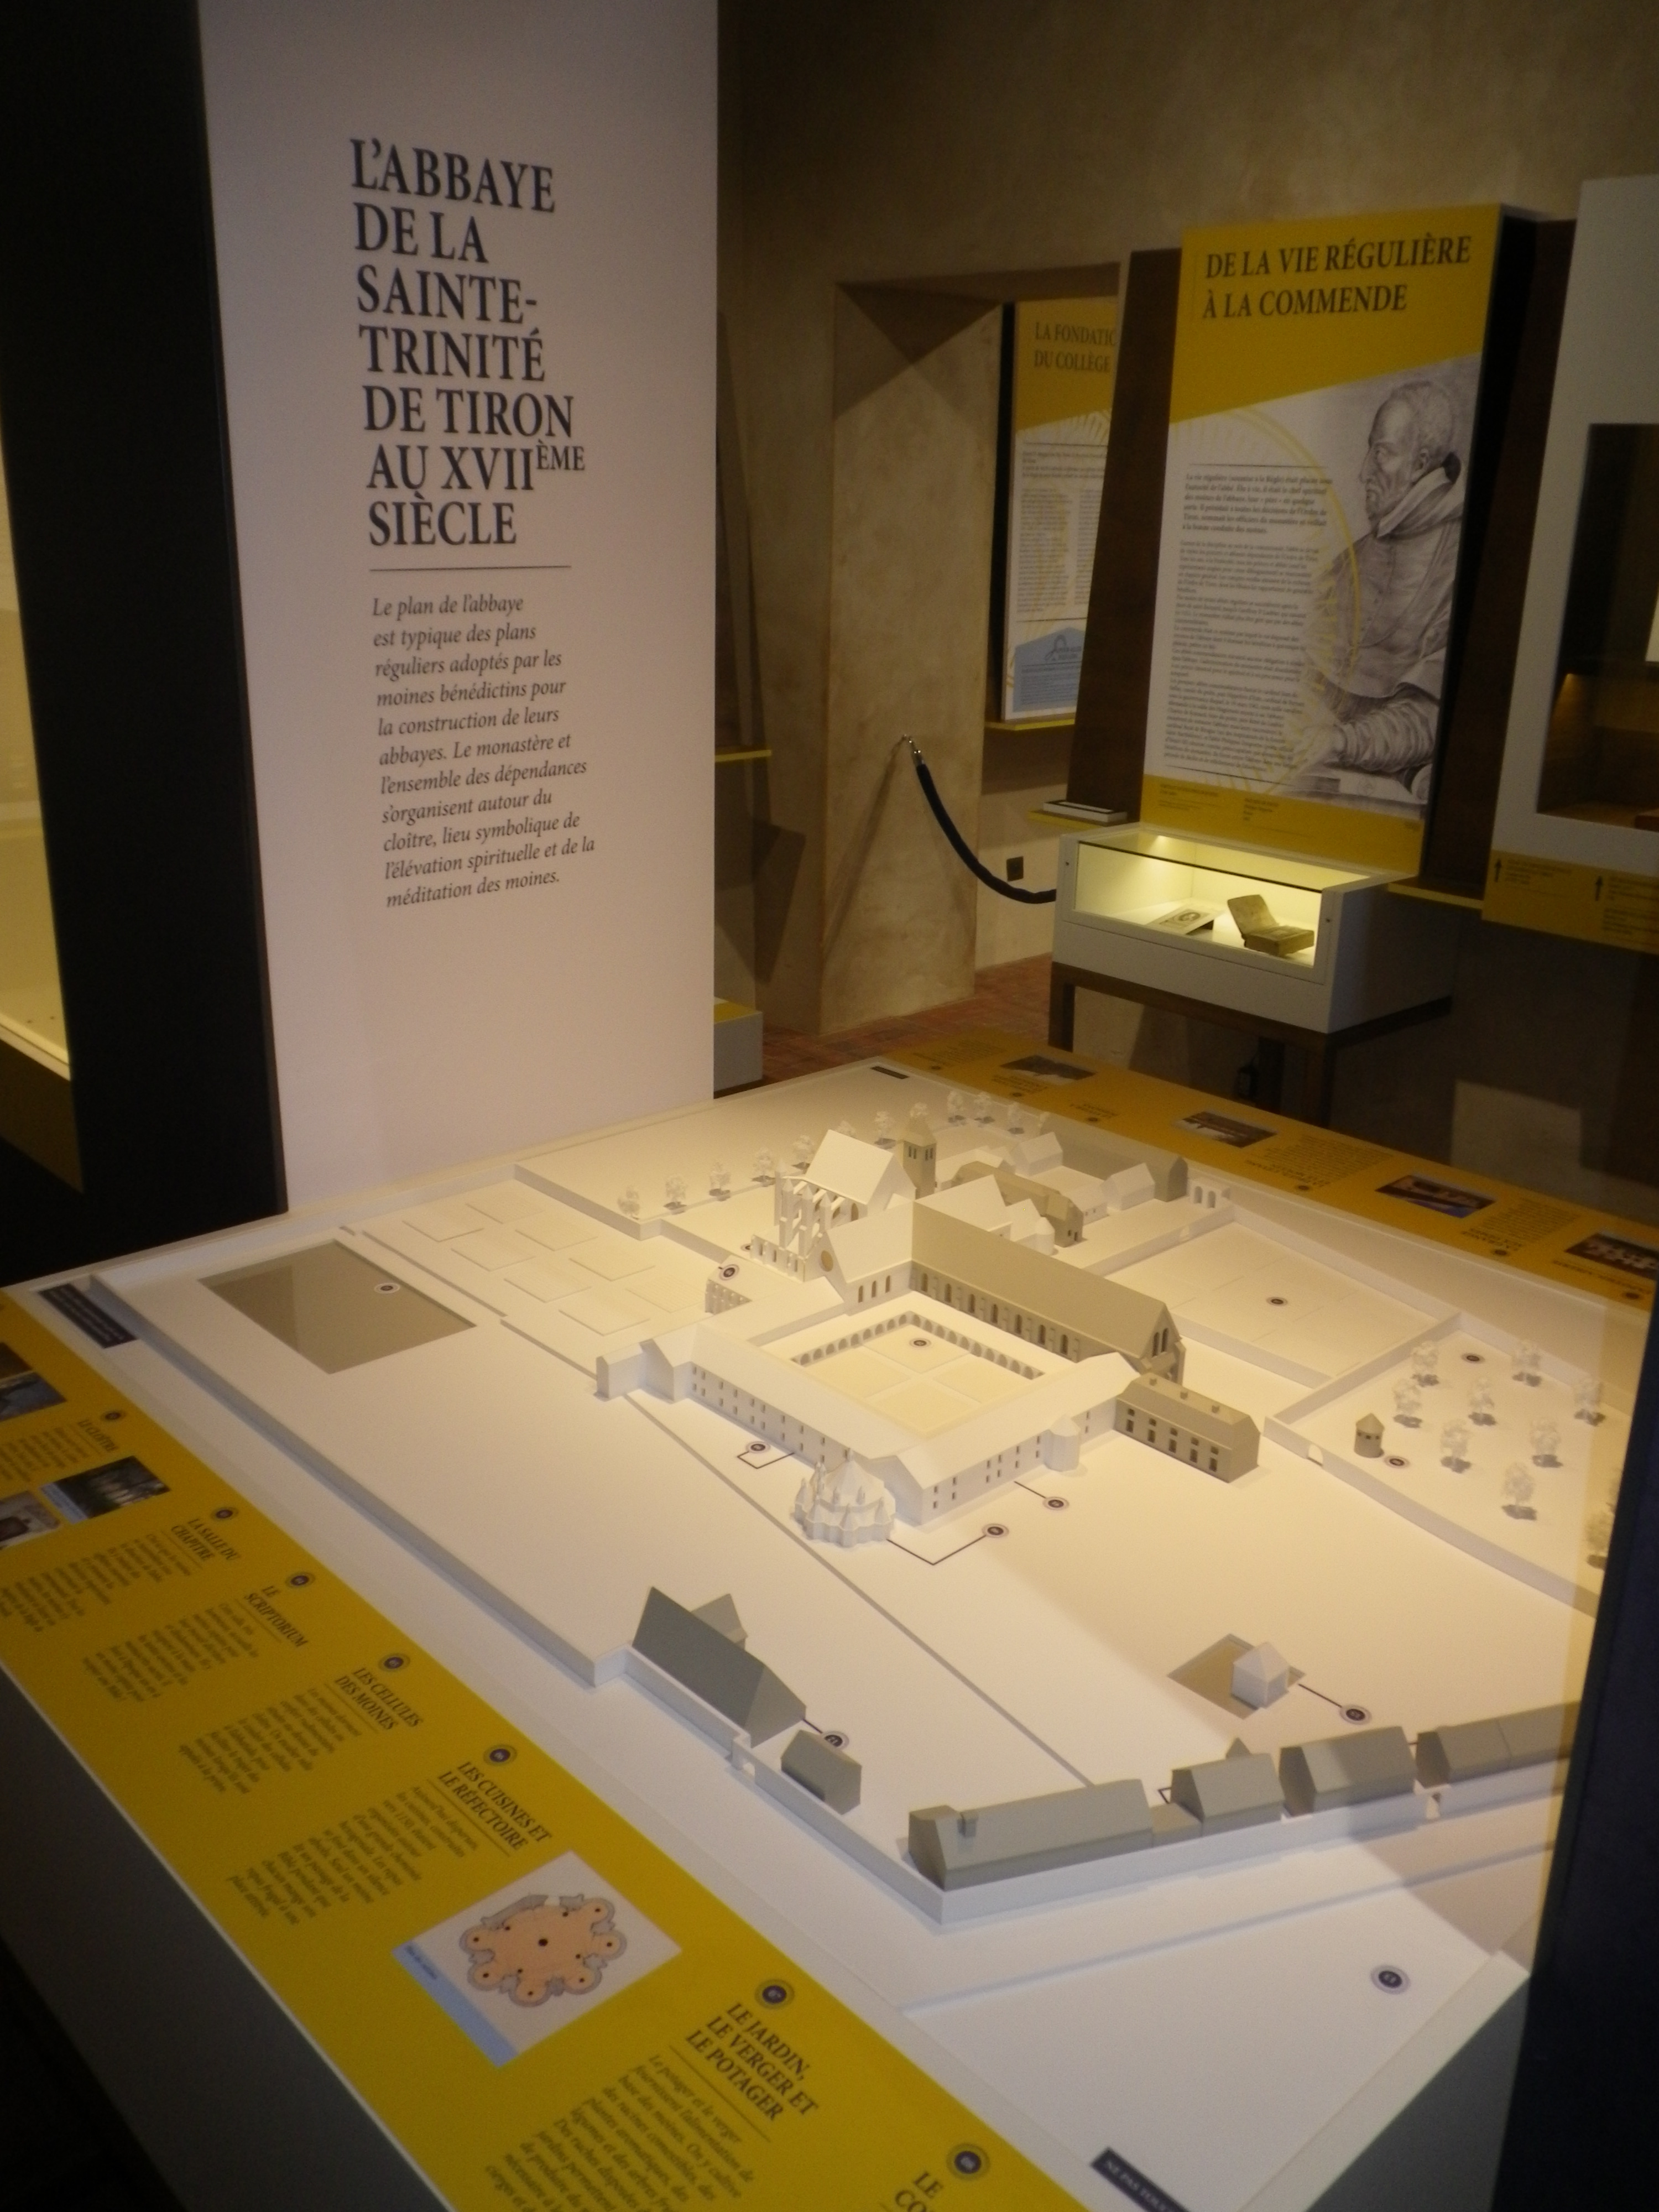 Musée Collège Royal stéphane berne